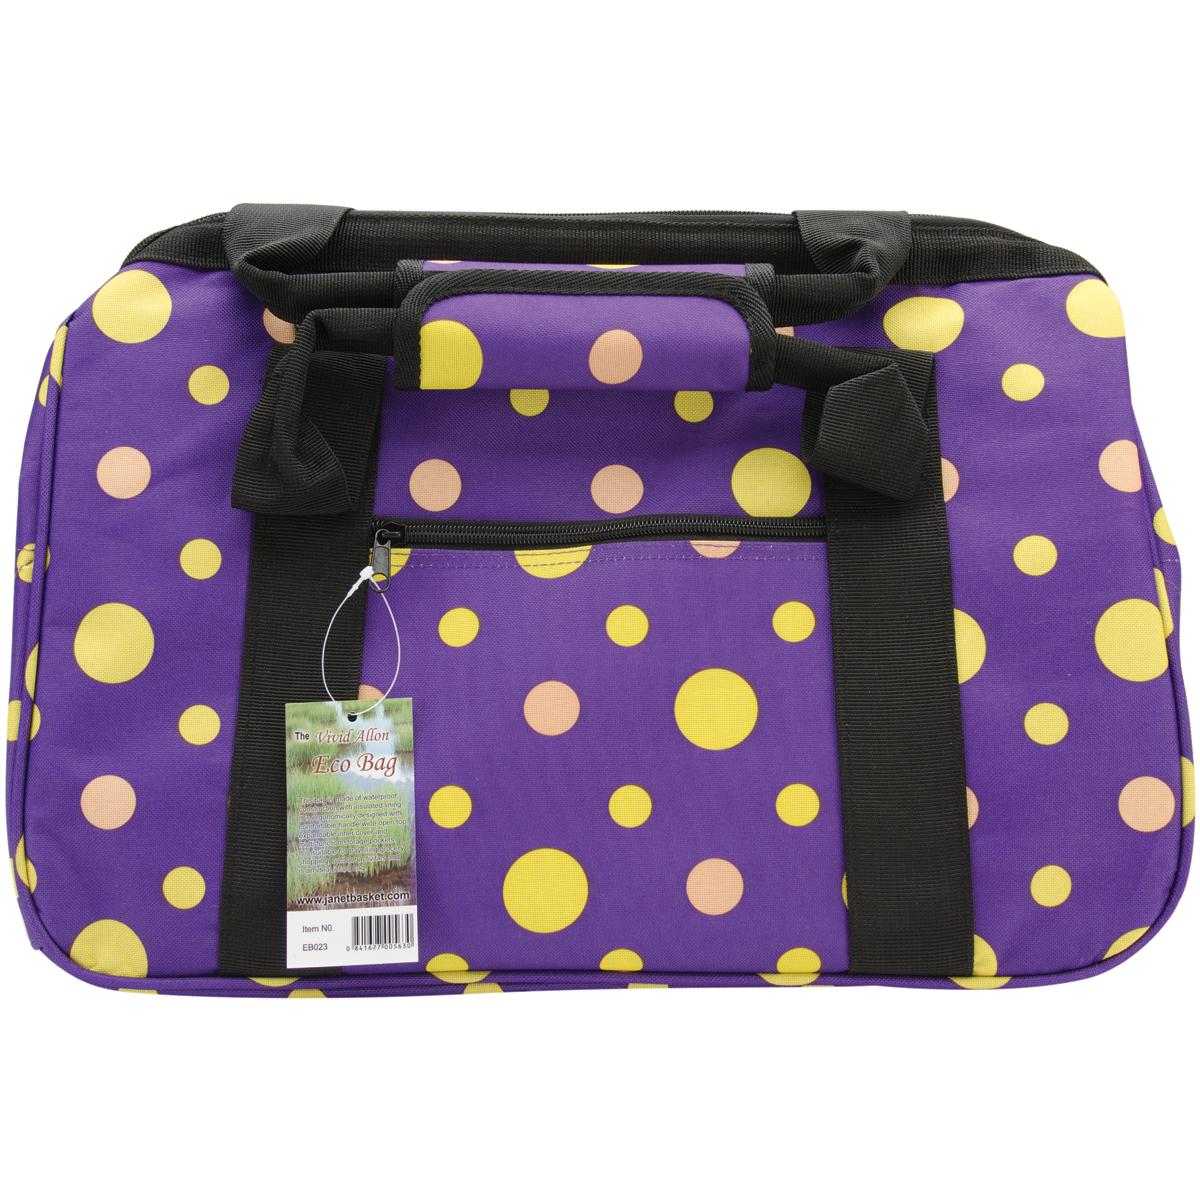 Twlight Bag